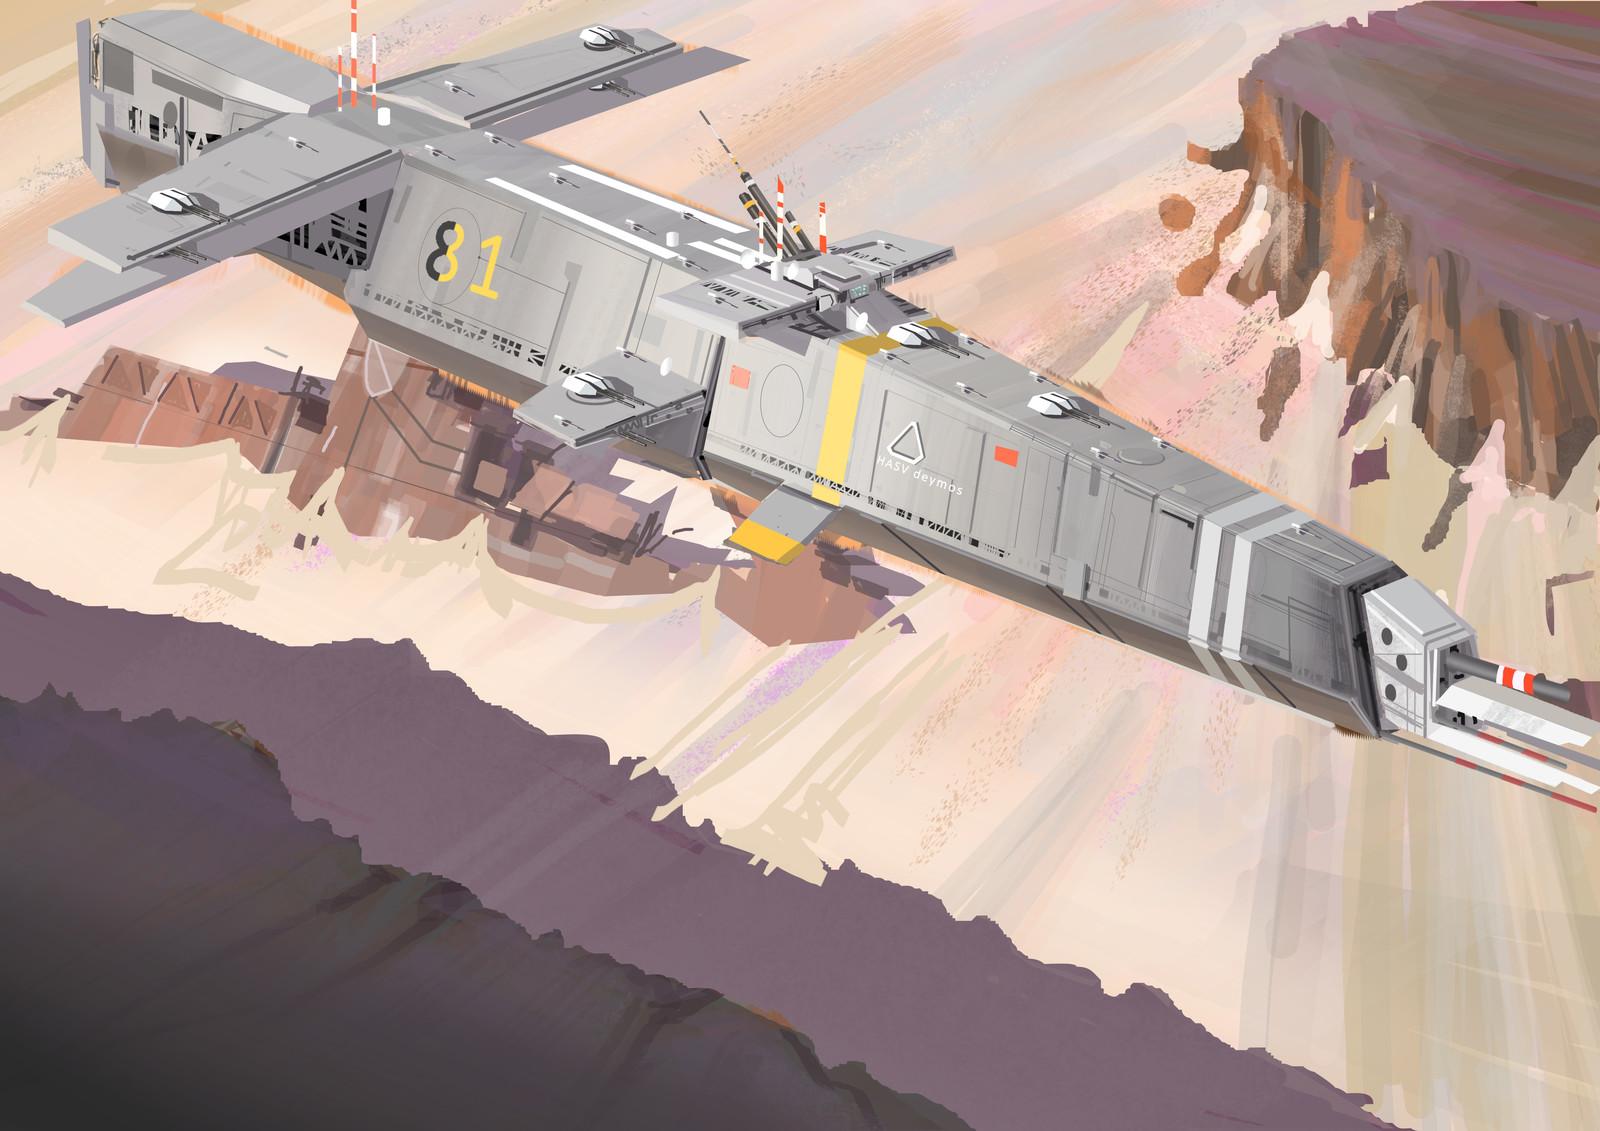 cruiser on planet TauLM27